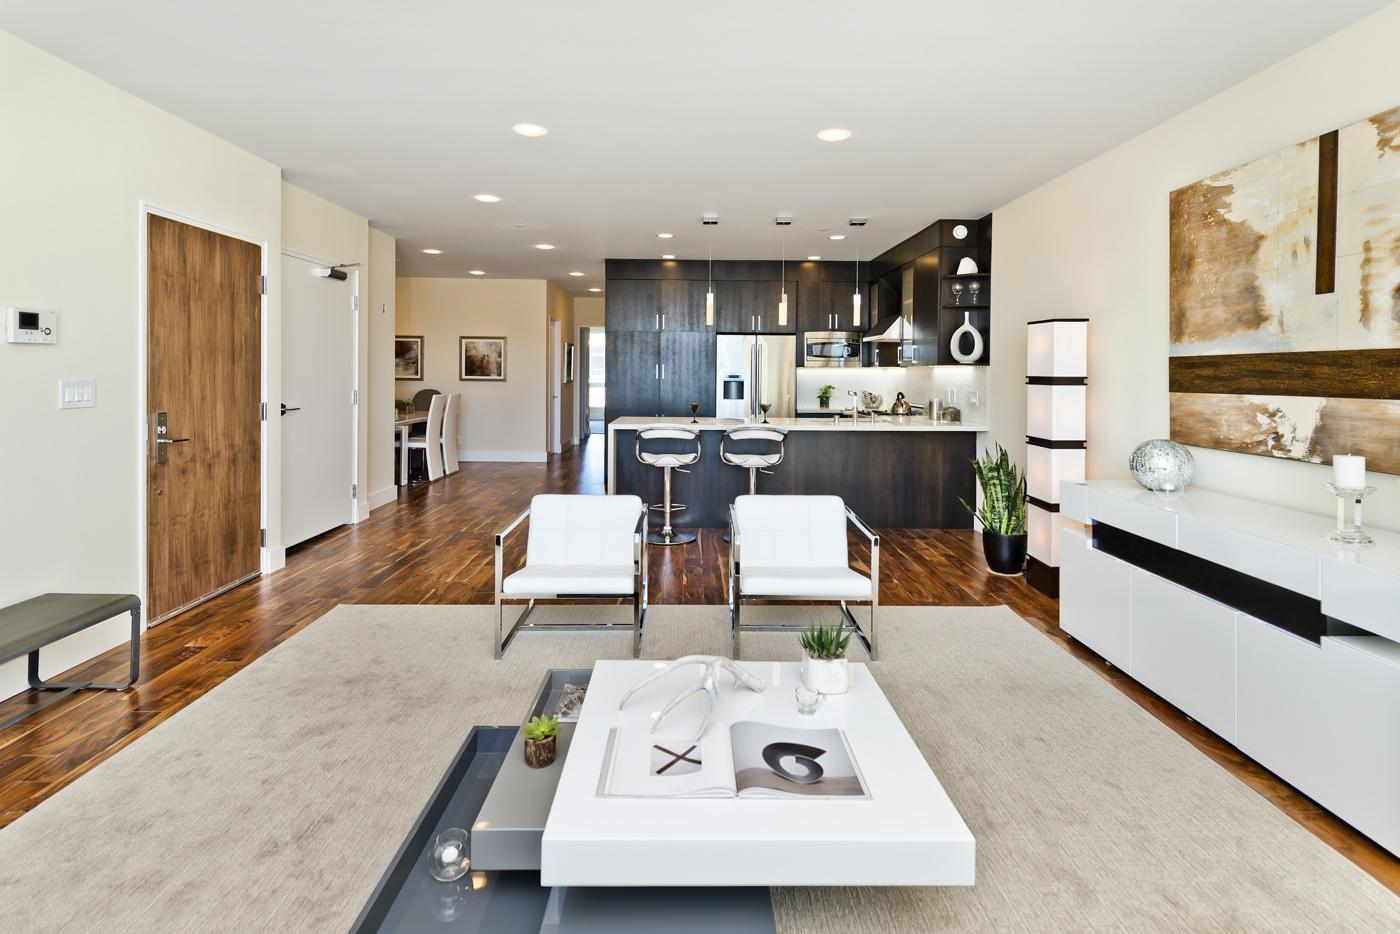 For Sale | Luxury Top Floor SOMA Condo | $1,095,000